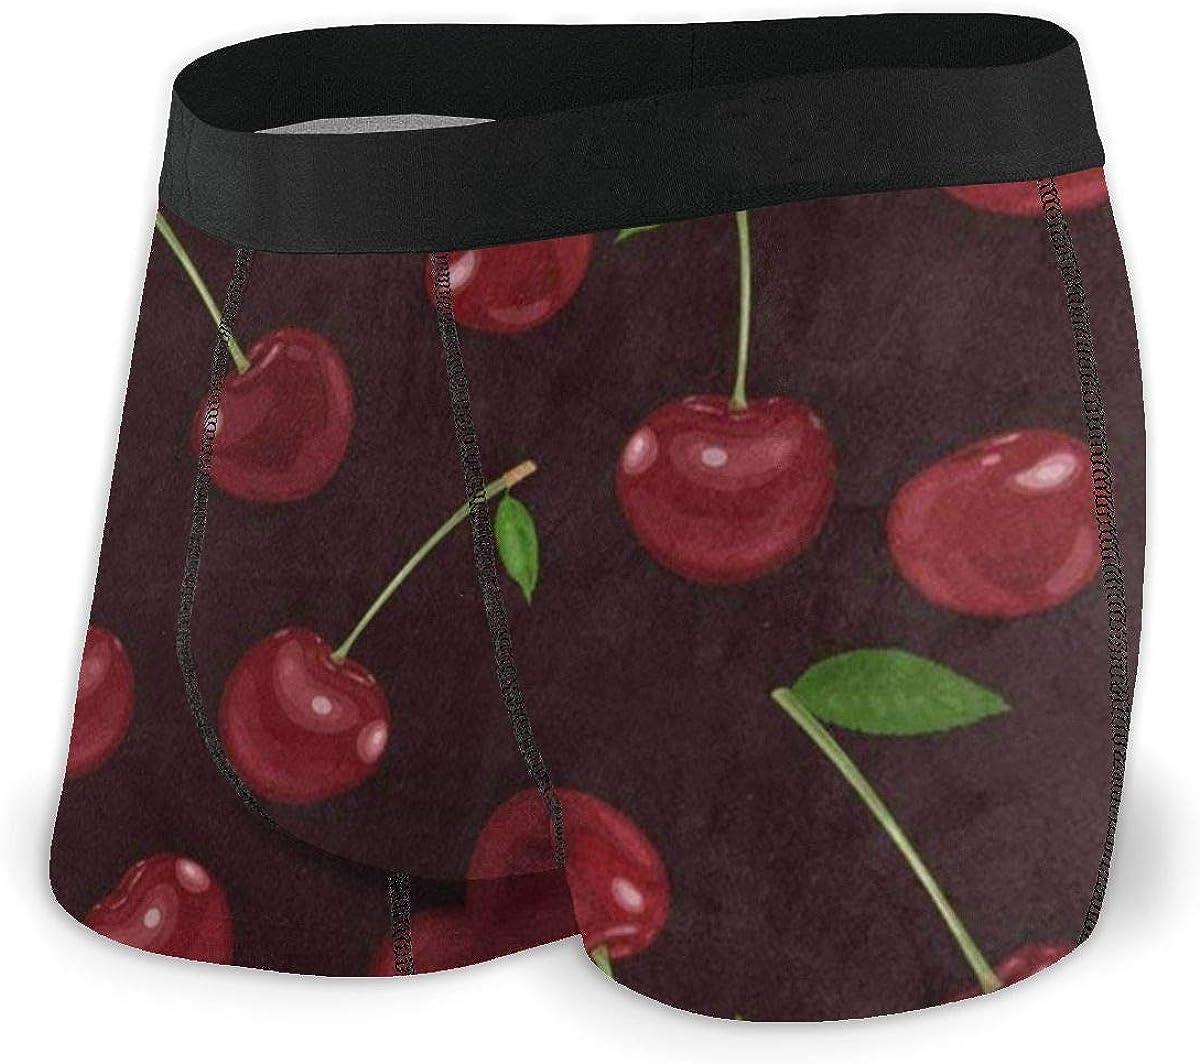 Mens Boxer Briefs Vintage Cherry Fruit Retro Breathable Underwear